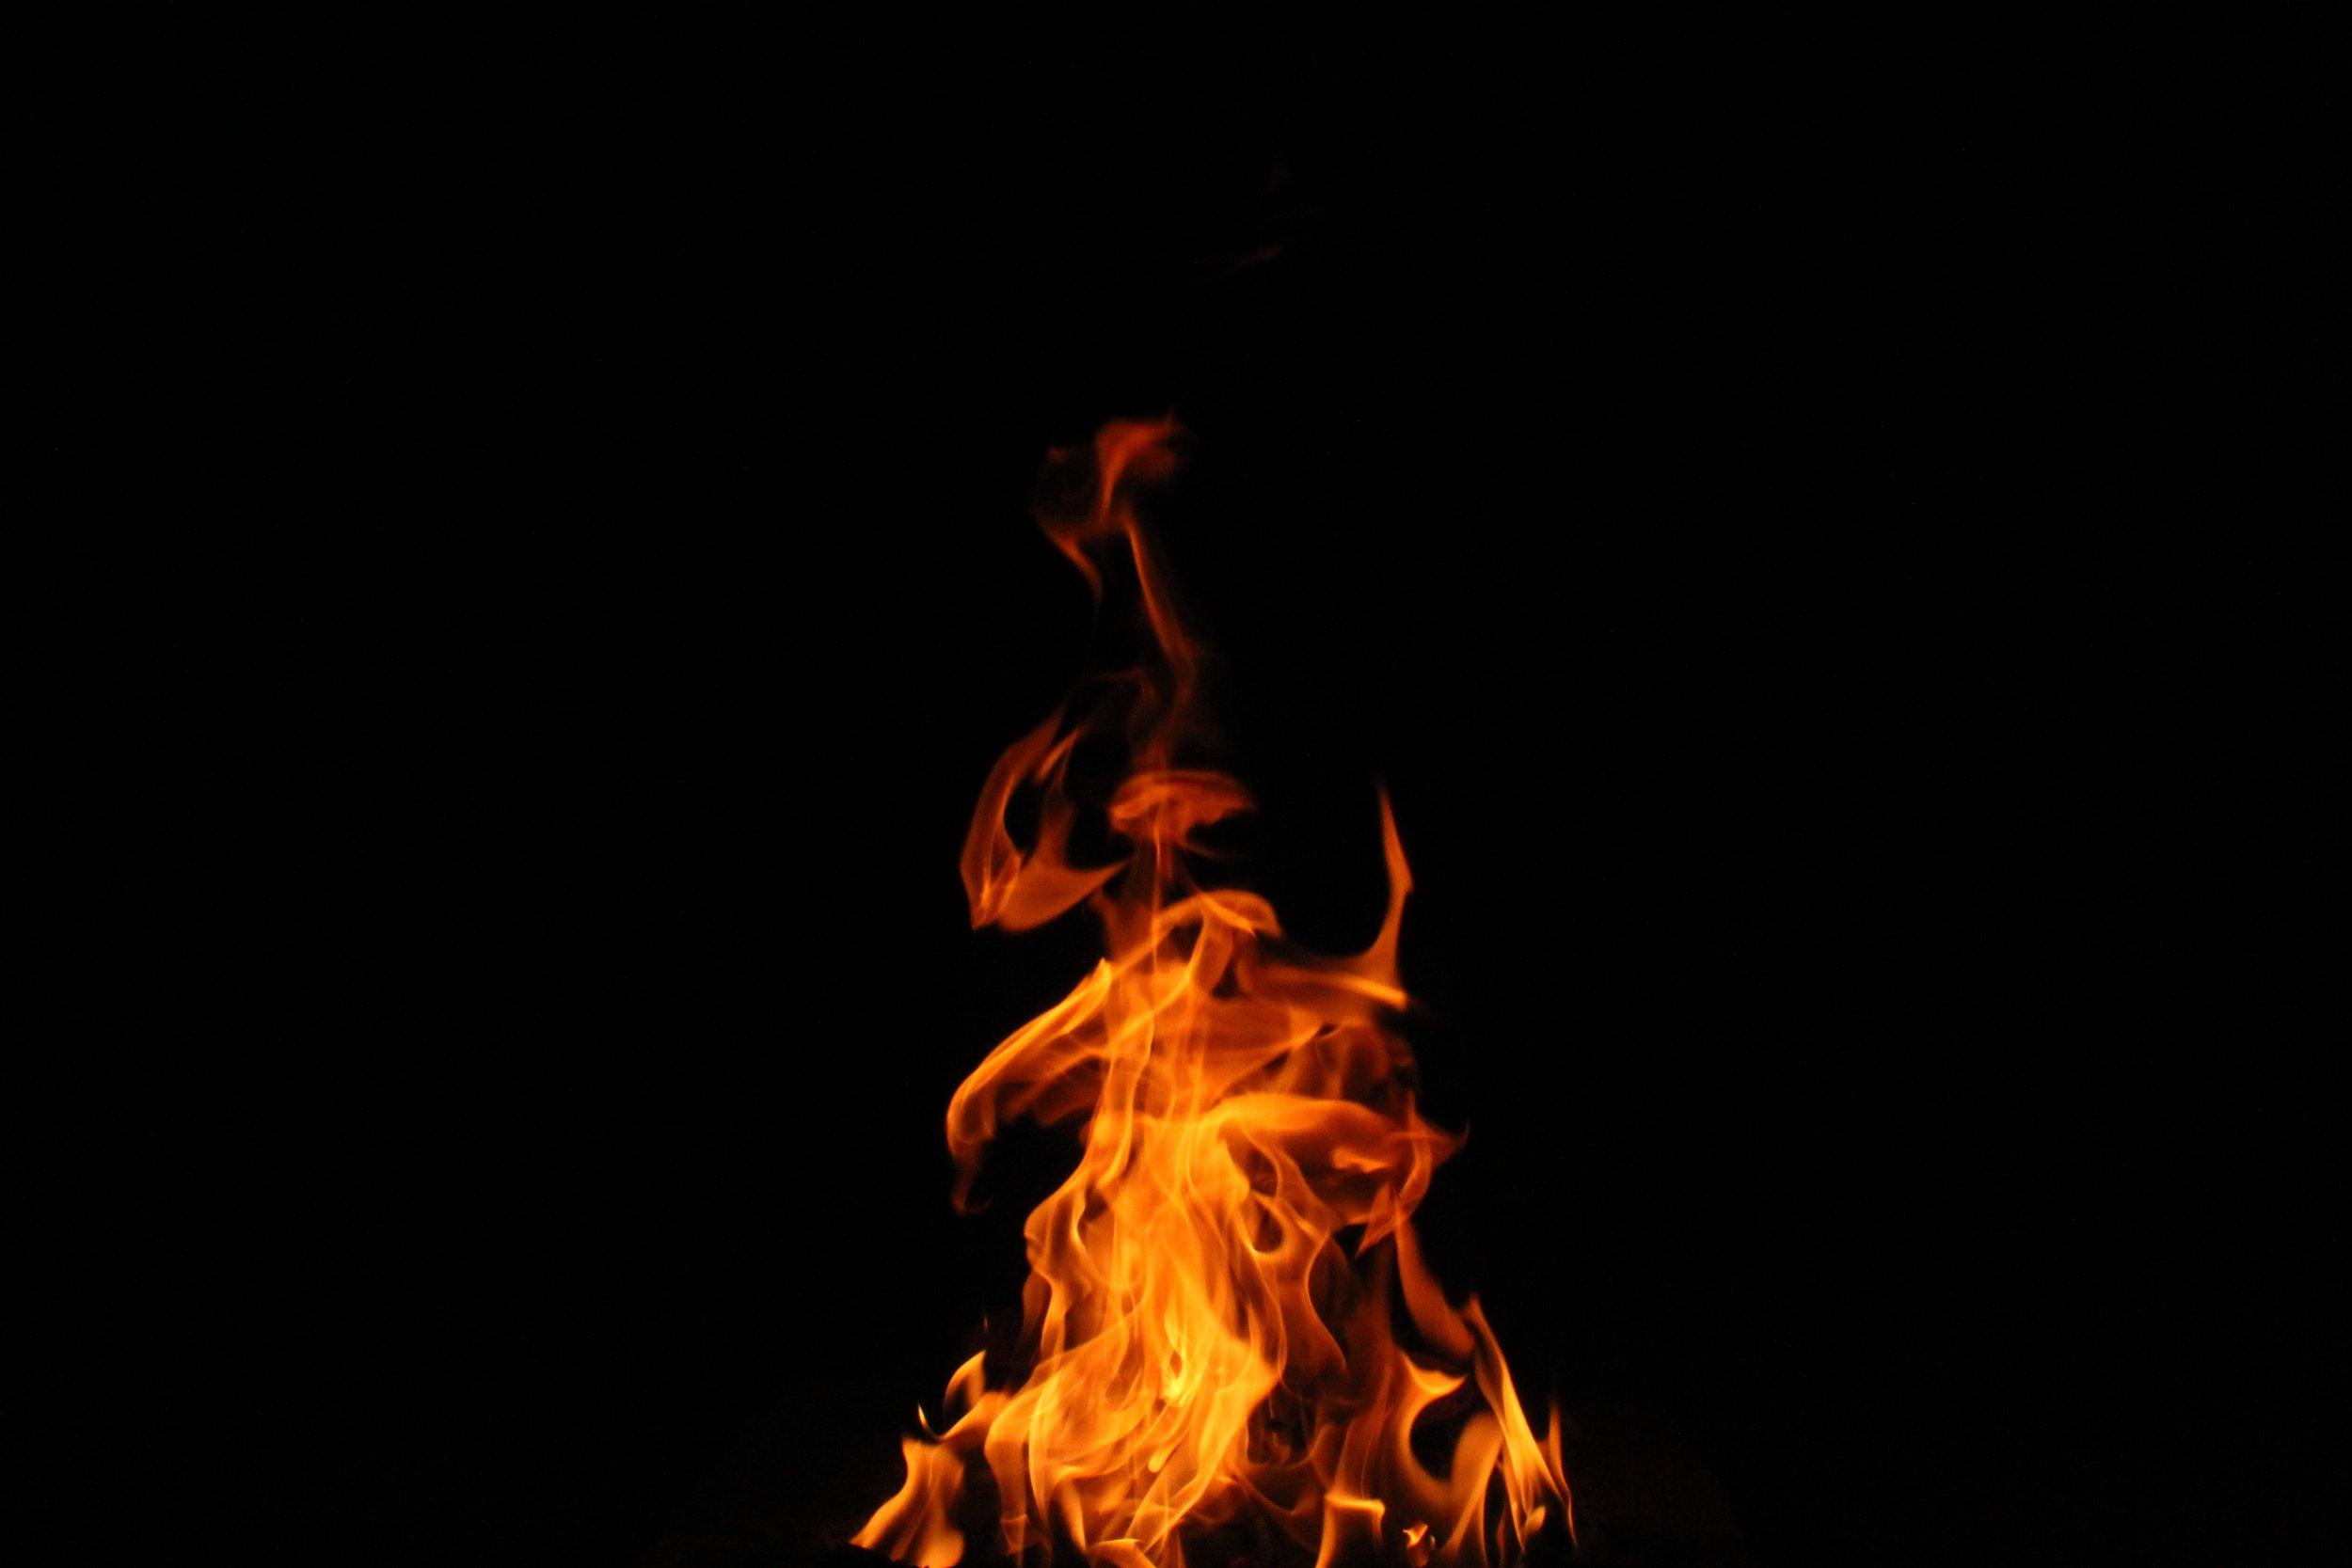 flames-fire-restant-roofing-shakes-cedur.jpg